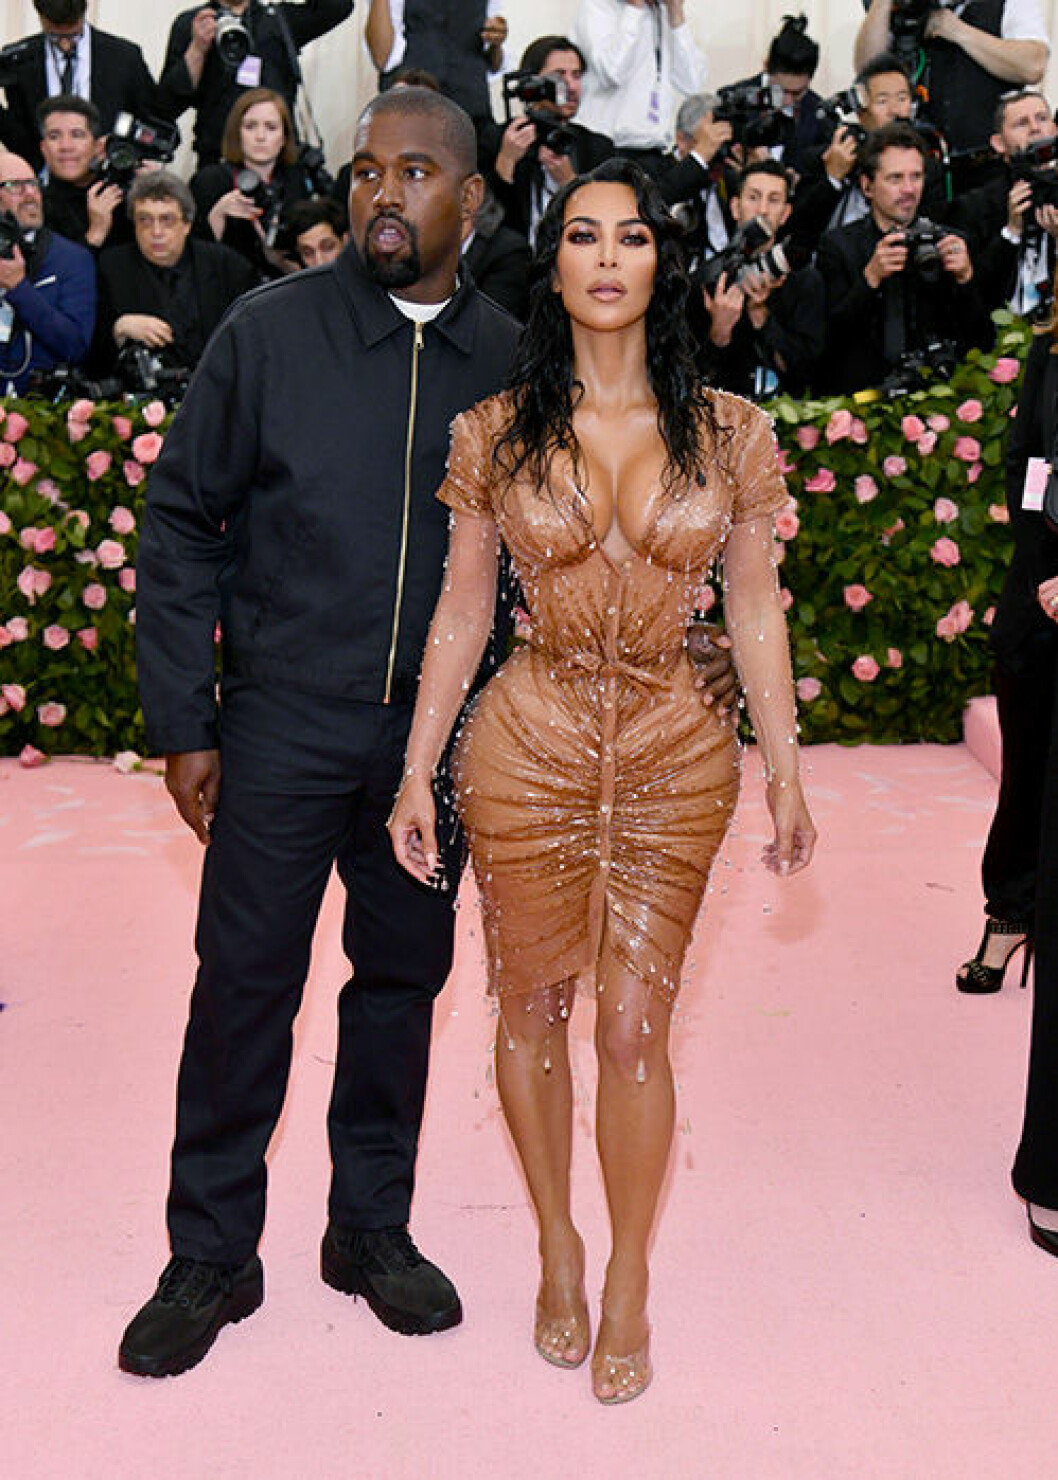 En bild på Kim Kardashian West och Kanye West på Met-galan 2019.